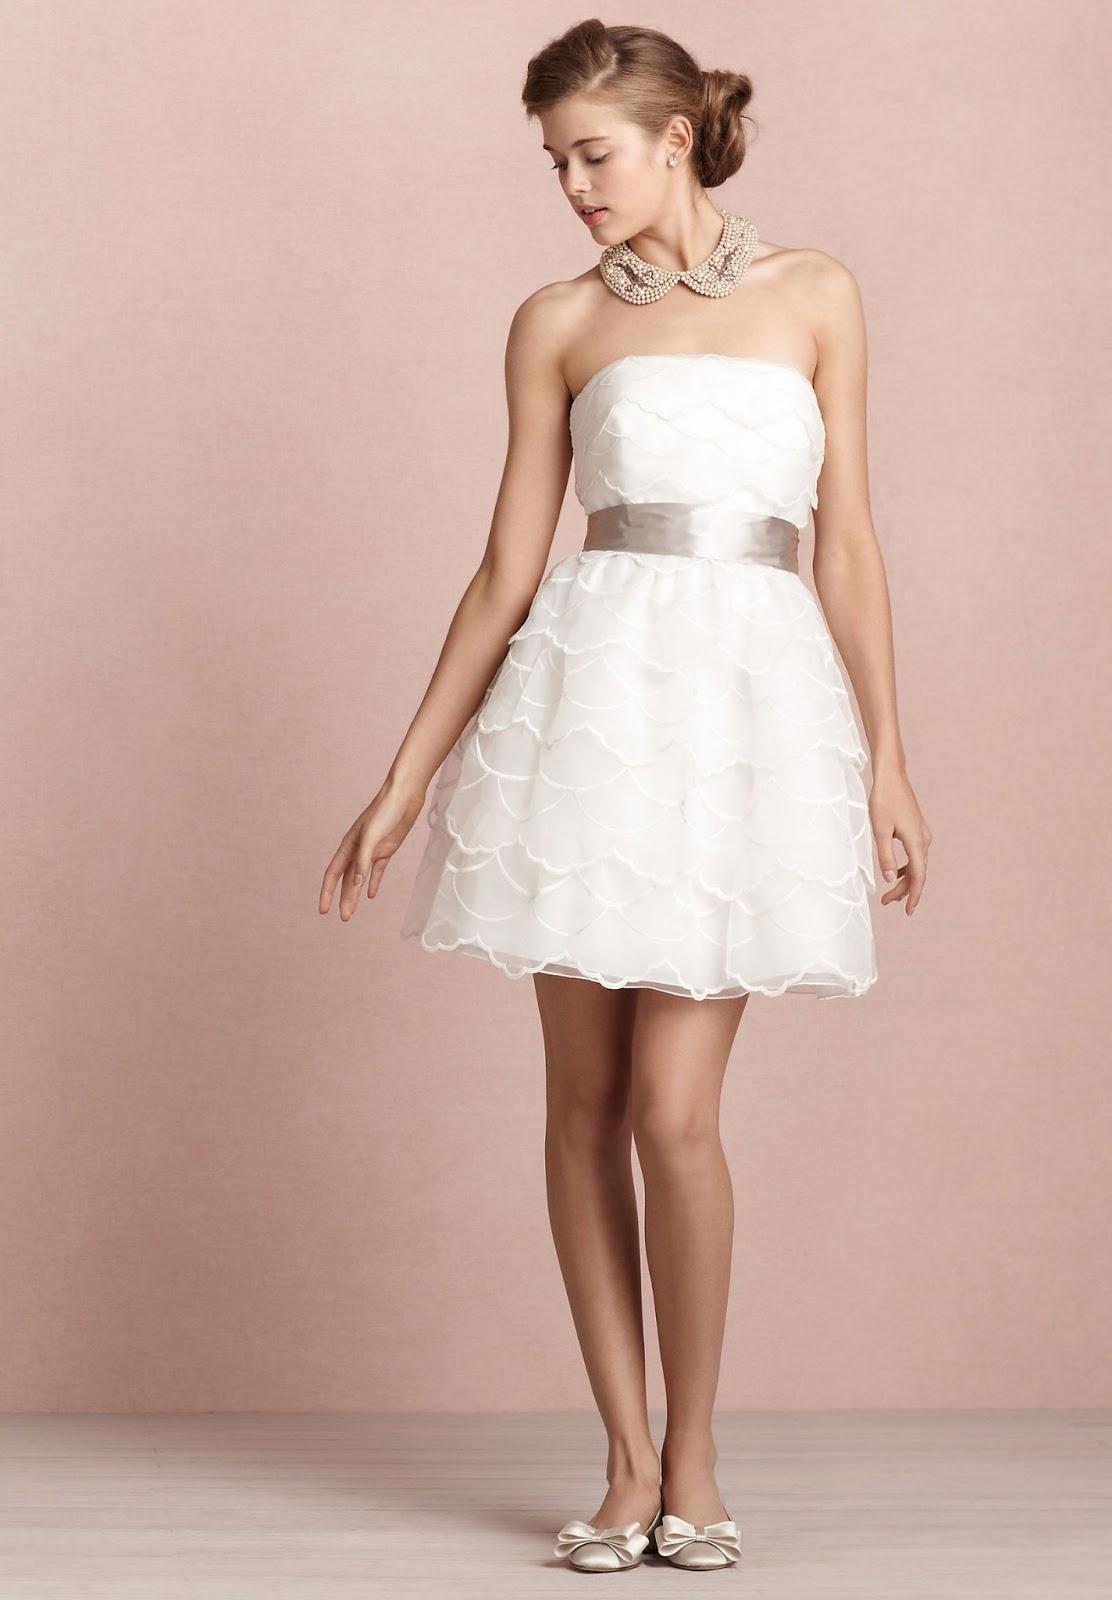 Wedding Reception Dresses: White Wedding Reception Dress In 2013